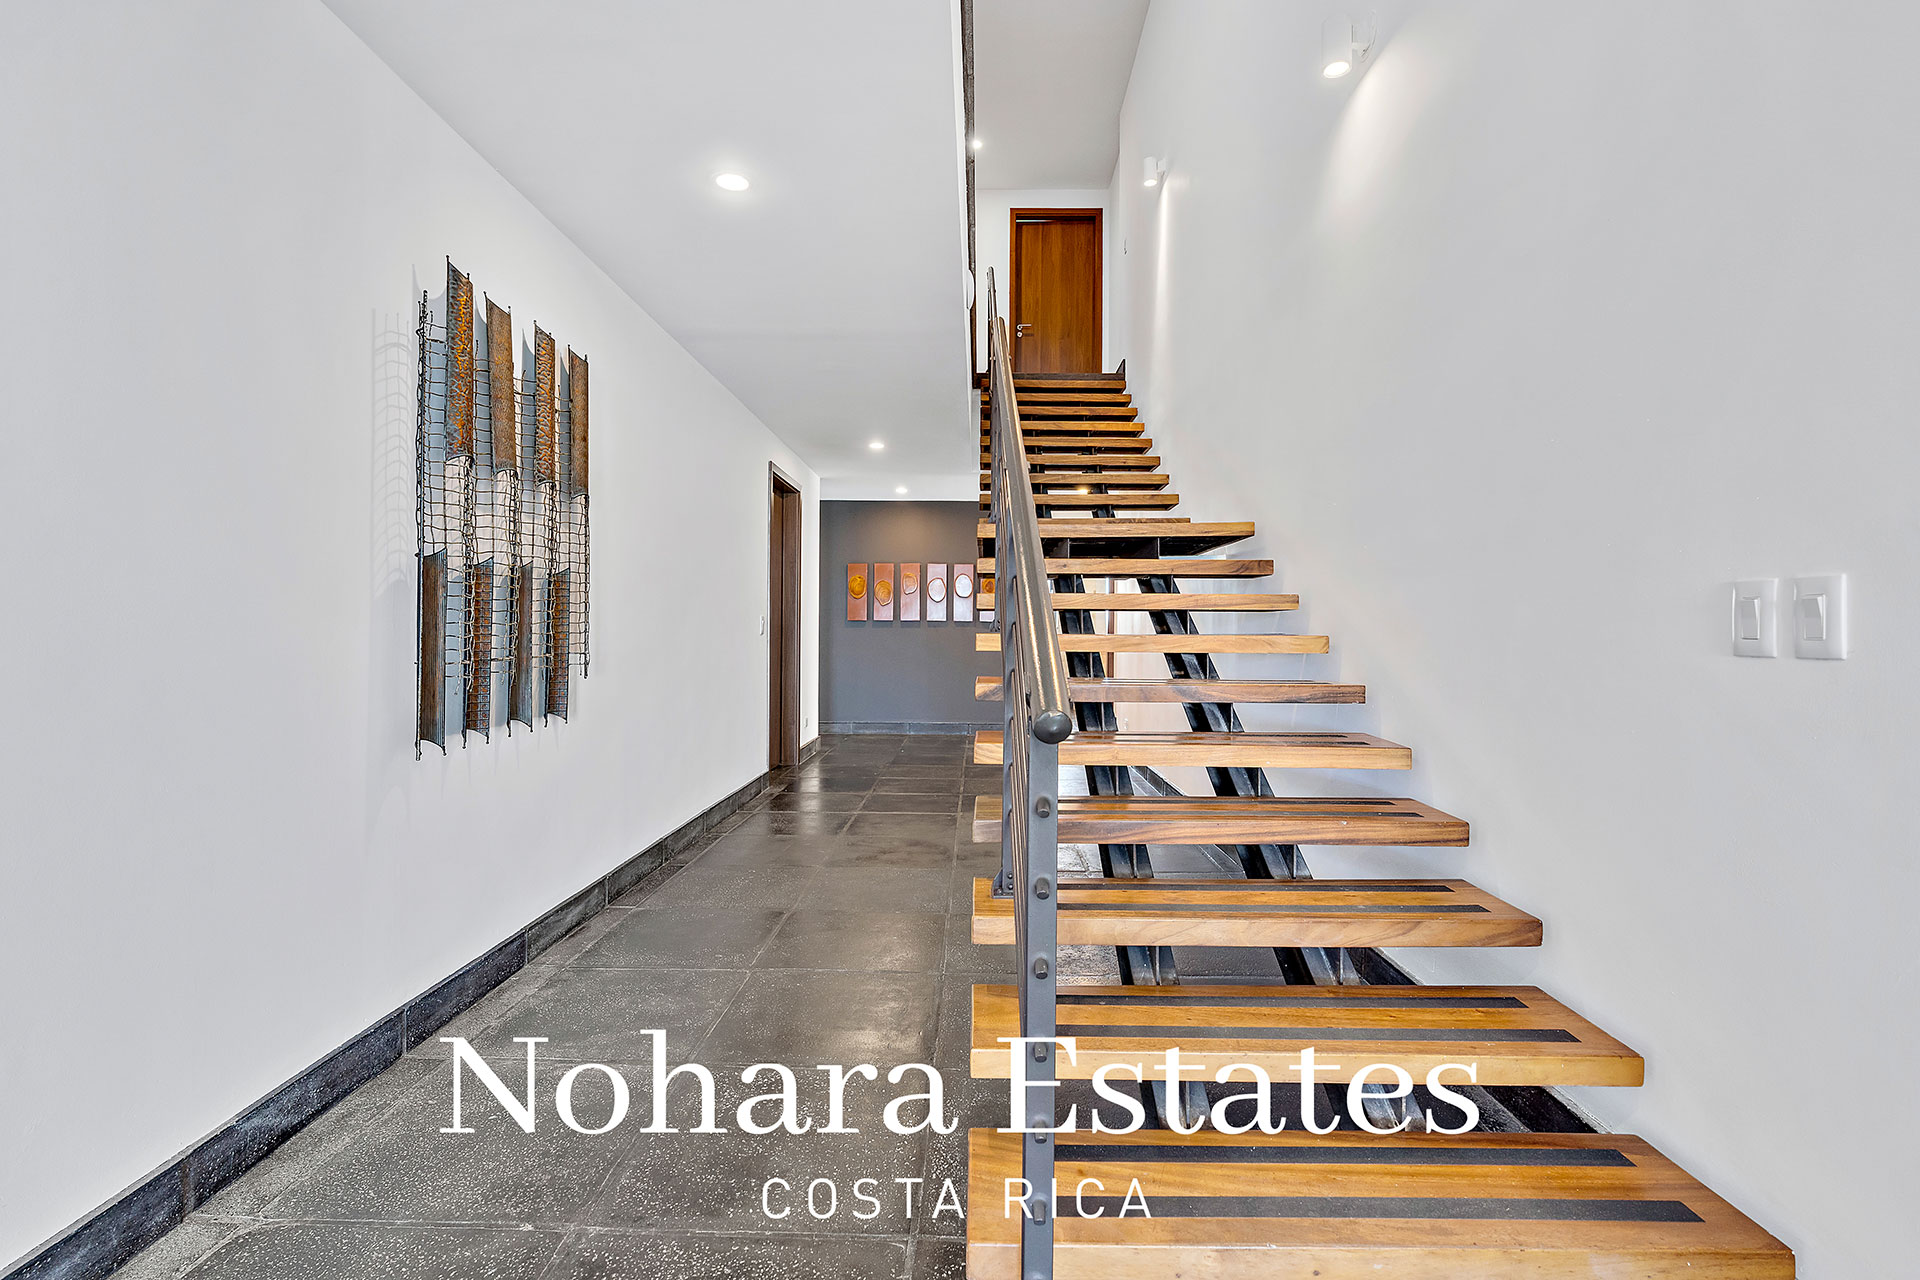 Nohara Estates Costa Rica 128 Penthouse Quepos Los Altos 1